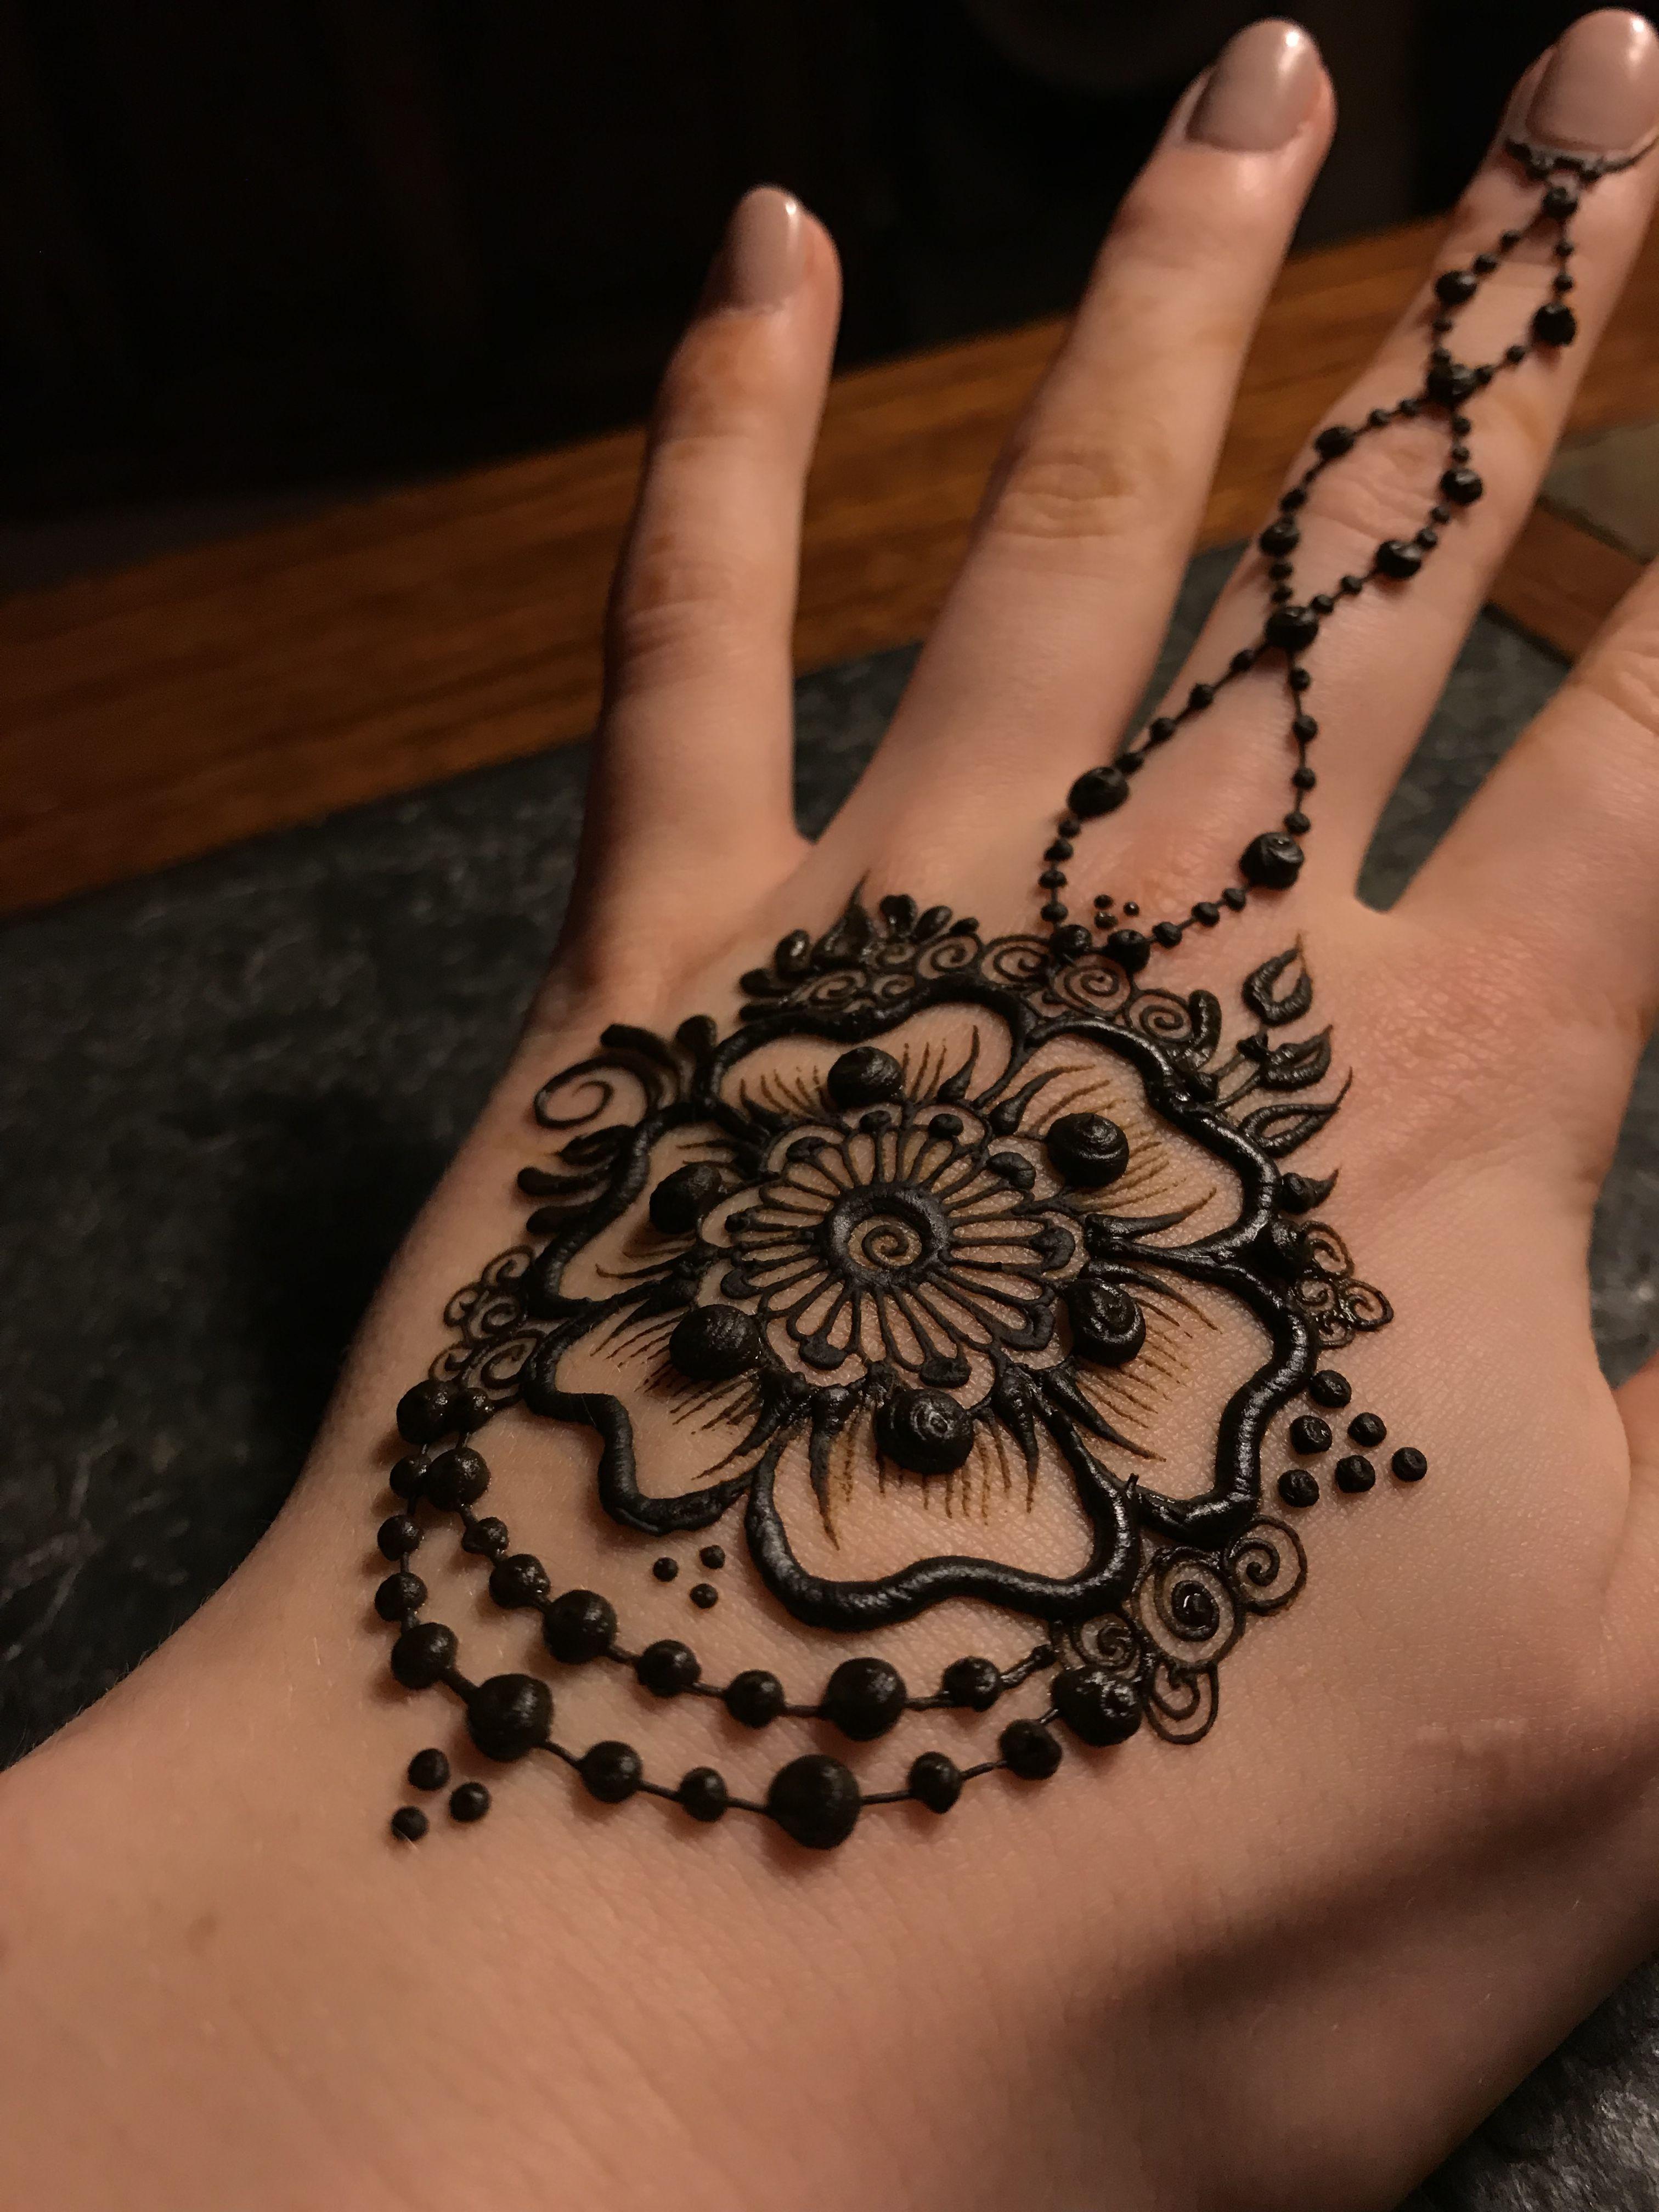 Mehndi Flower Tattoo Designs: Flower Henna Image By Samantha Jacoby On Henna